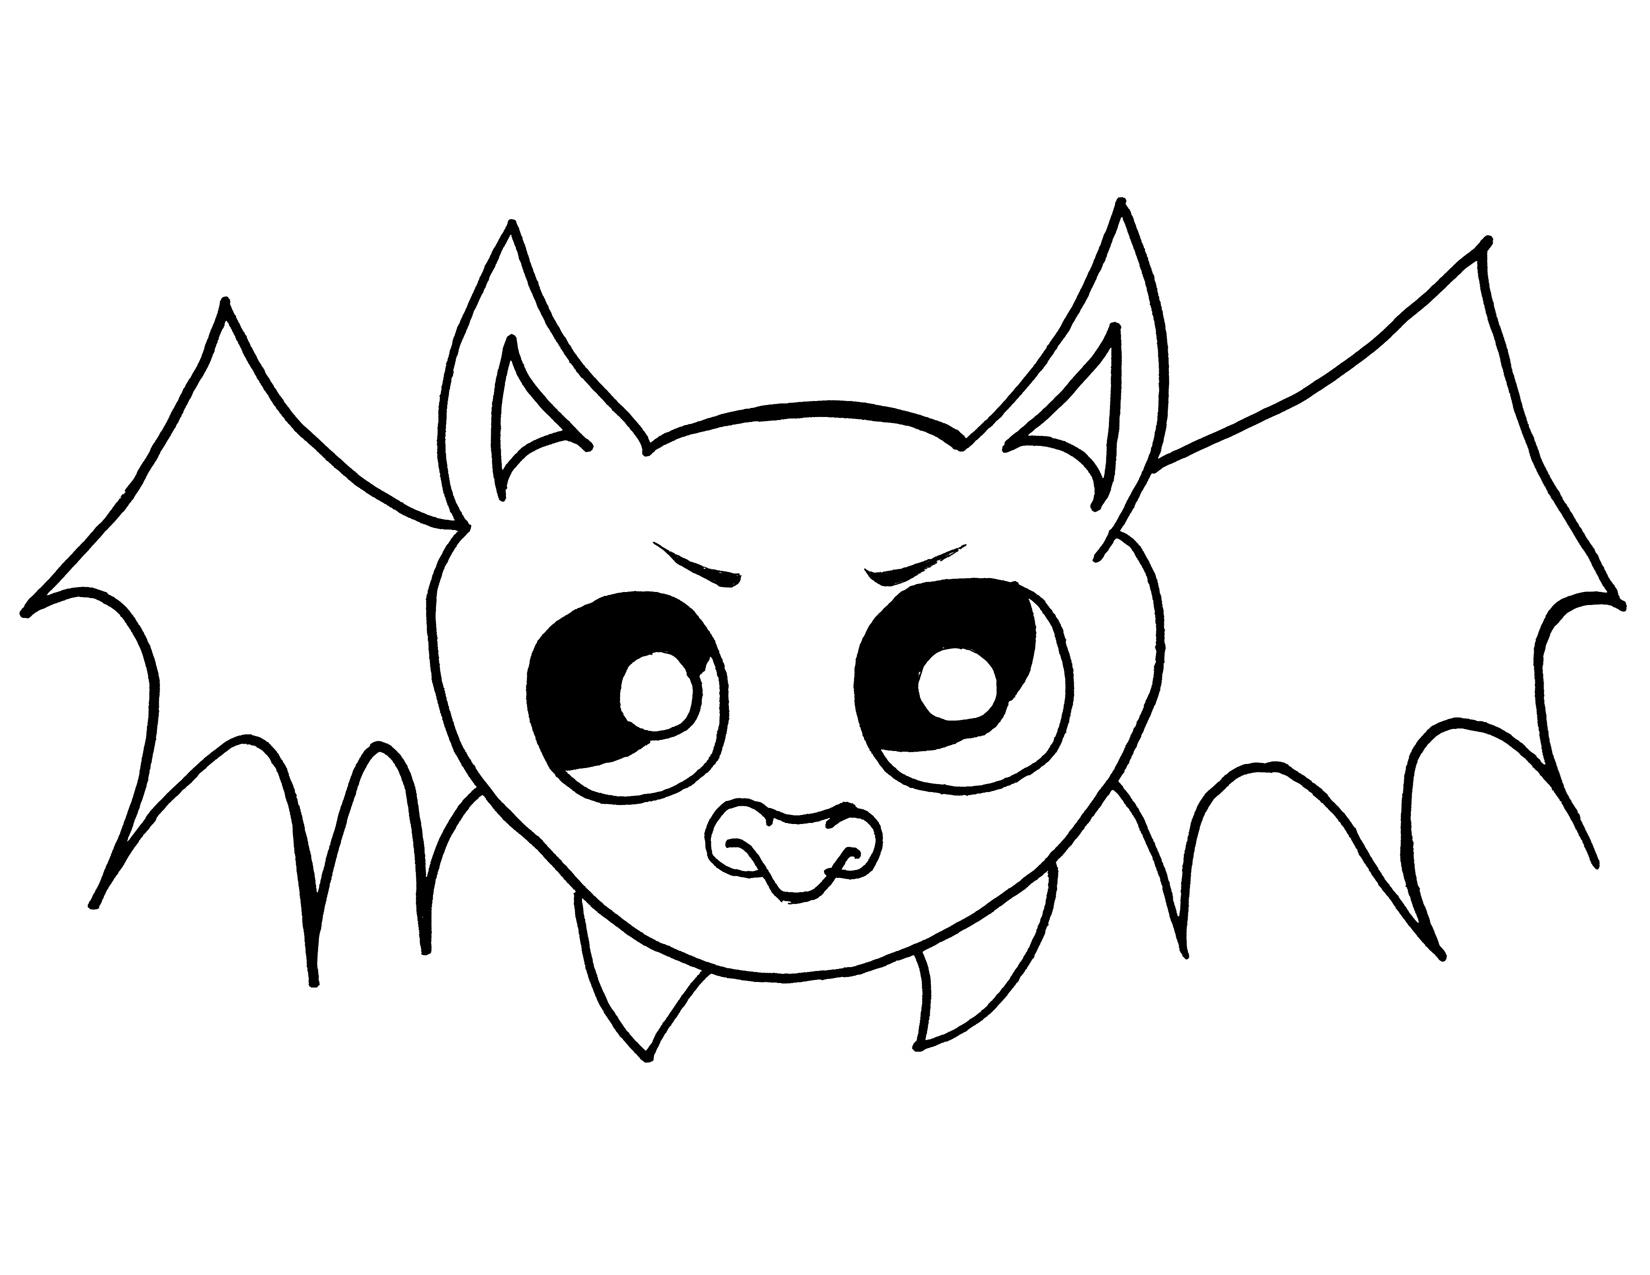 1650x1275 Bats Drawings Halloween Fun For Christmas